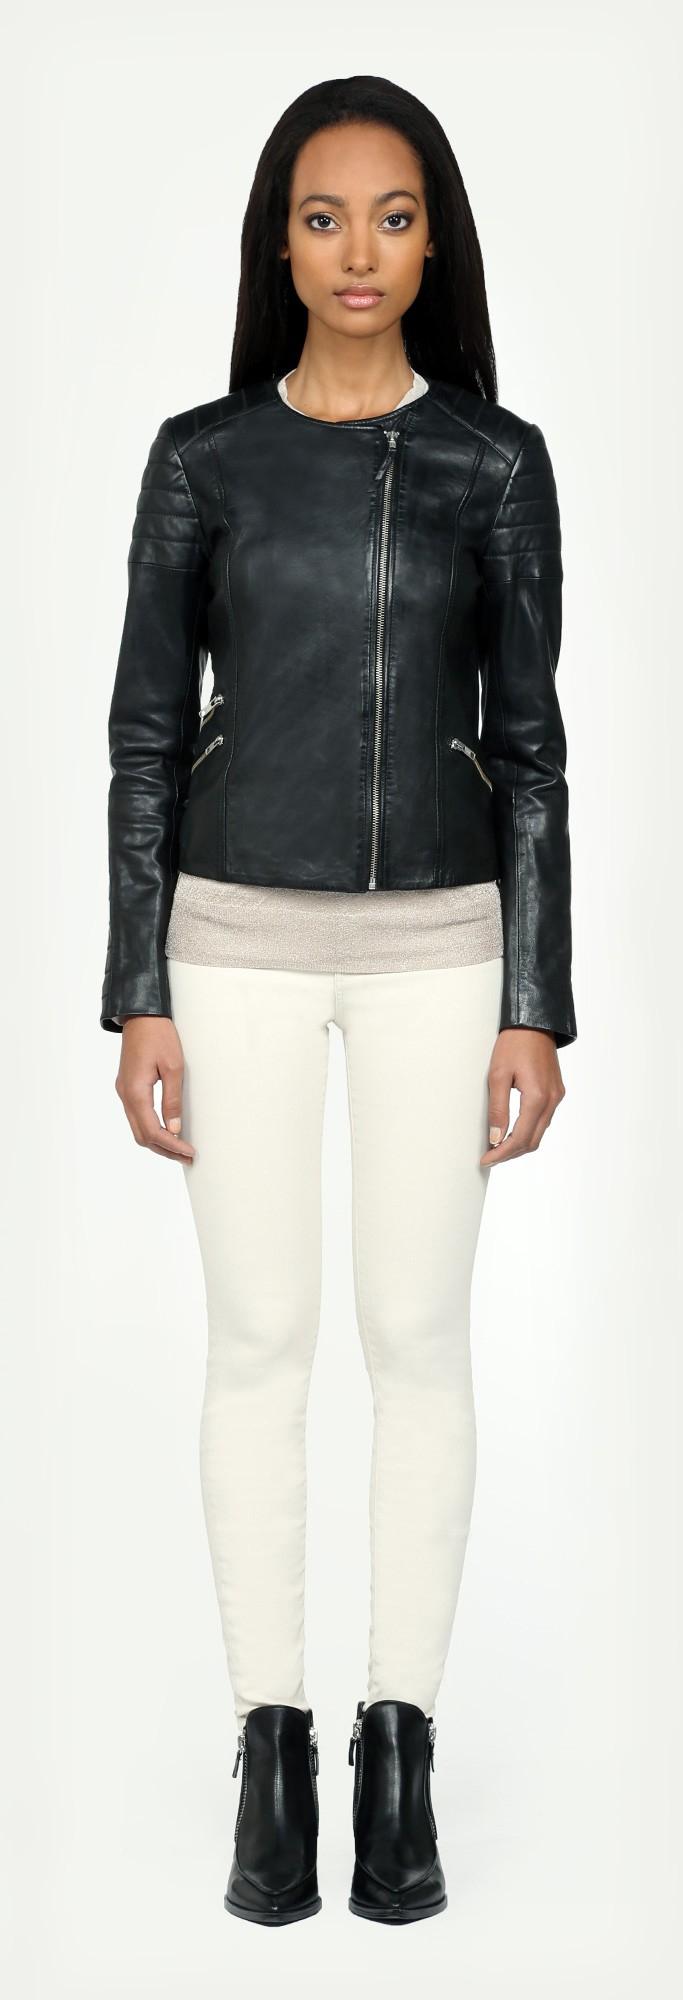 4da84303b SOIA & KYO Trudy Black Collarless Biker Leather Jacket in Black - Lyst